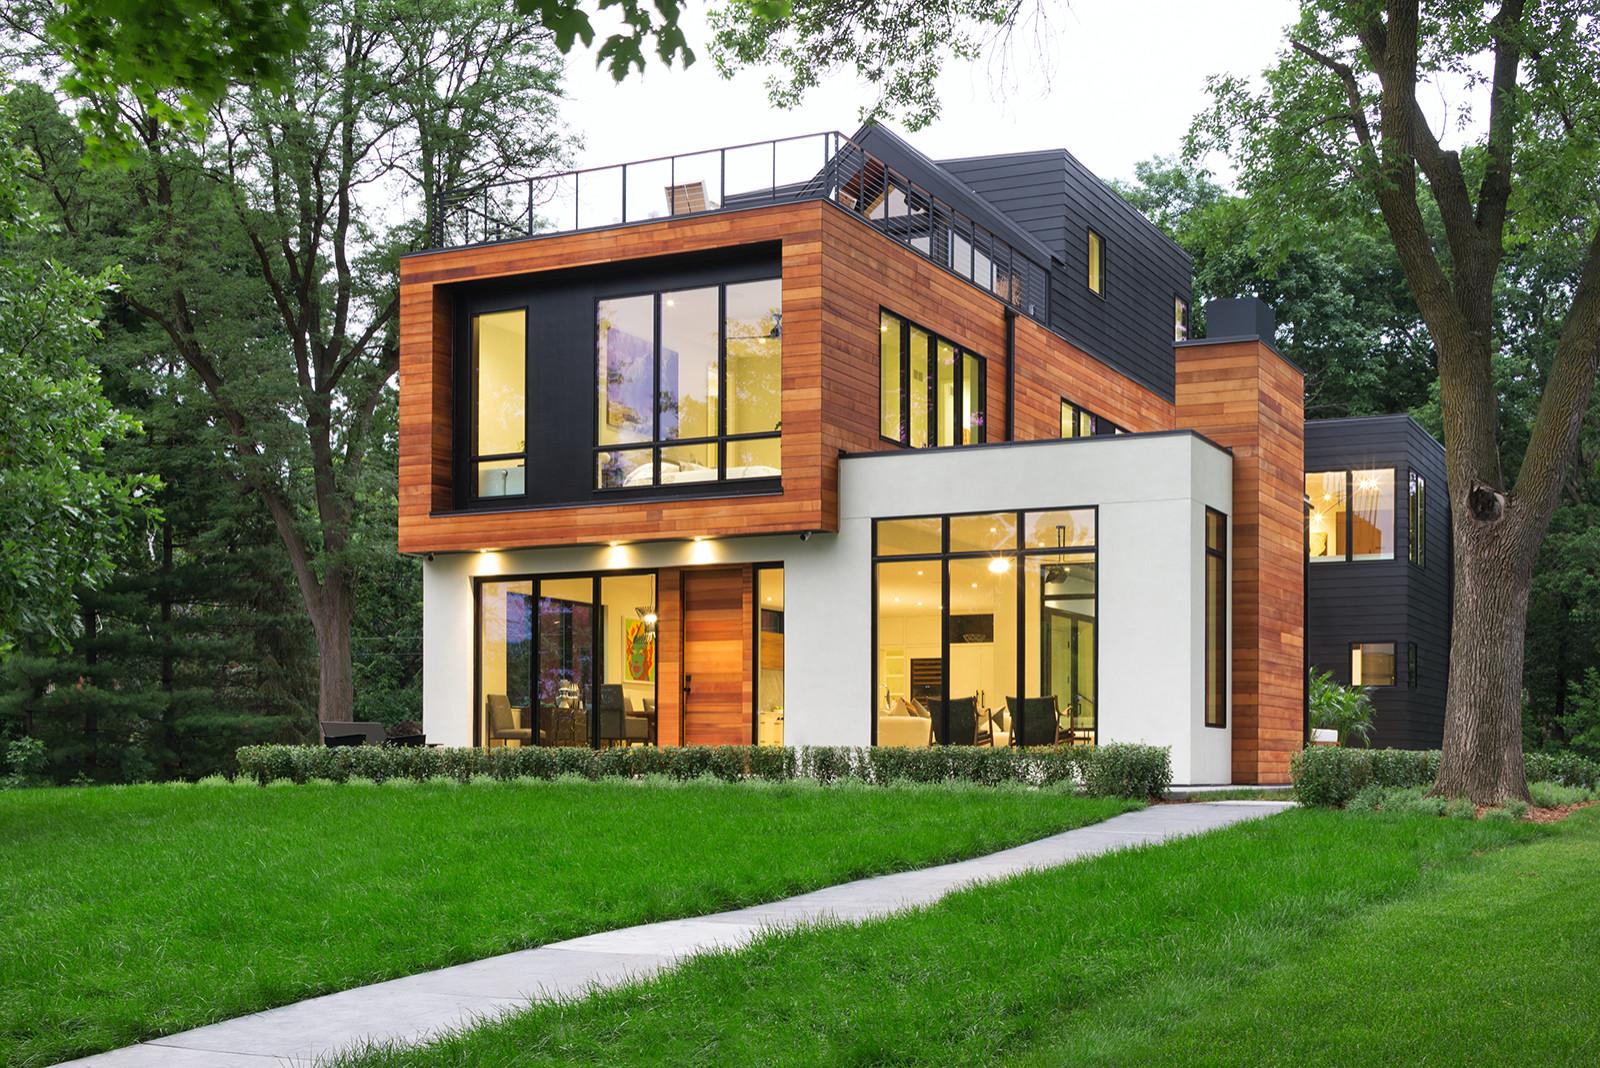 75 Beautiful Contemporary Exterior Home Pictures Ideas February 2021 Houzz